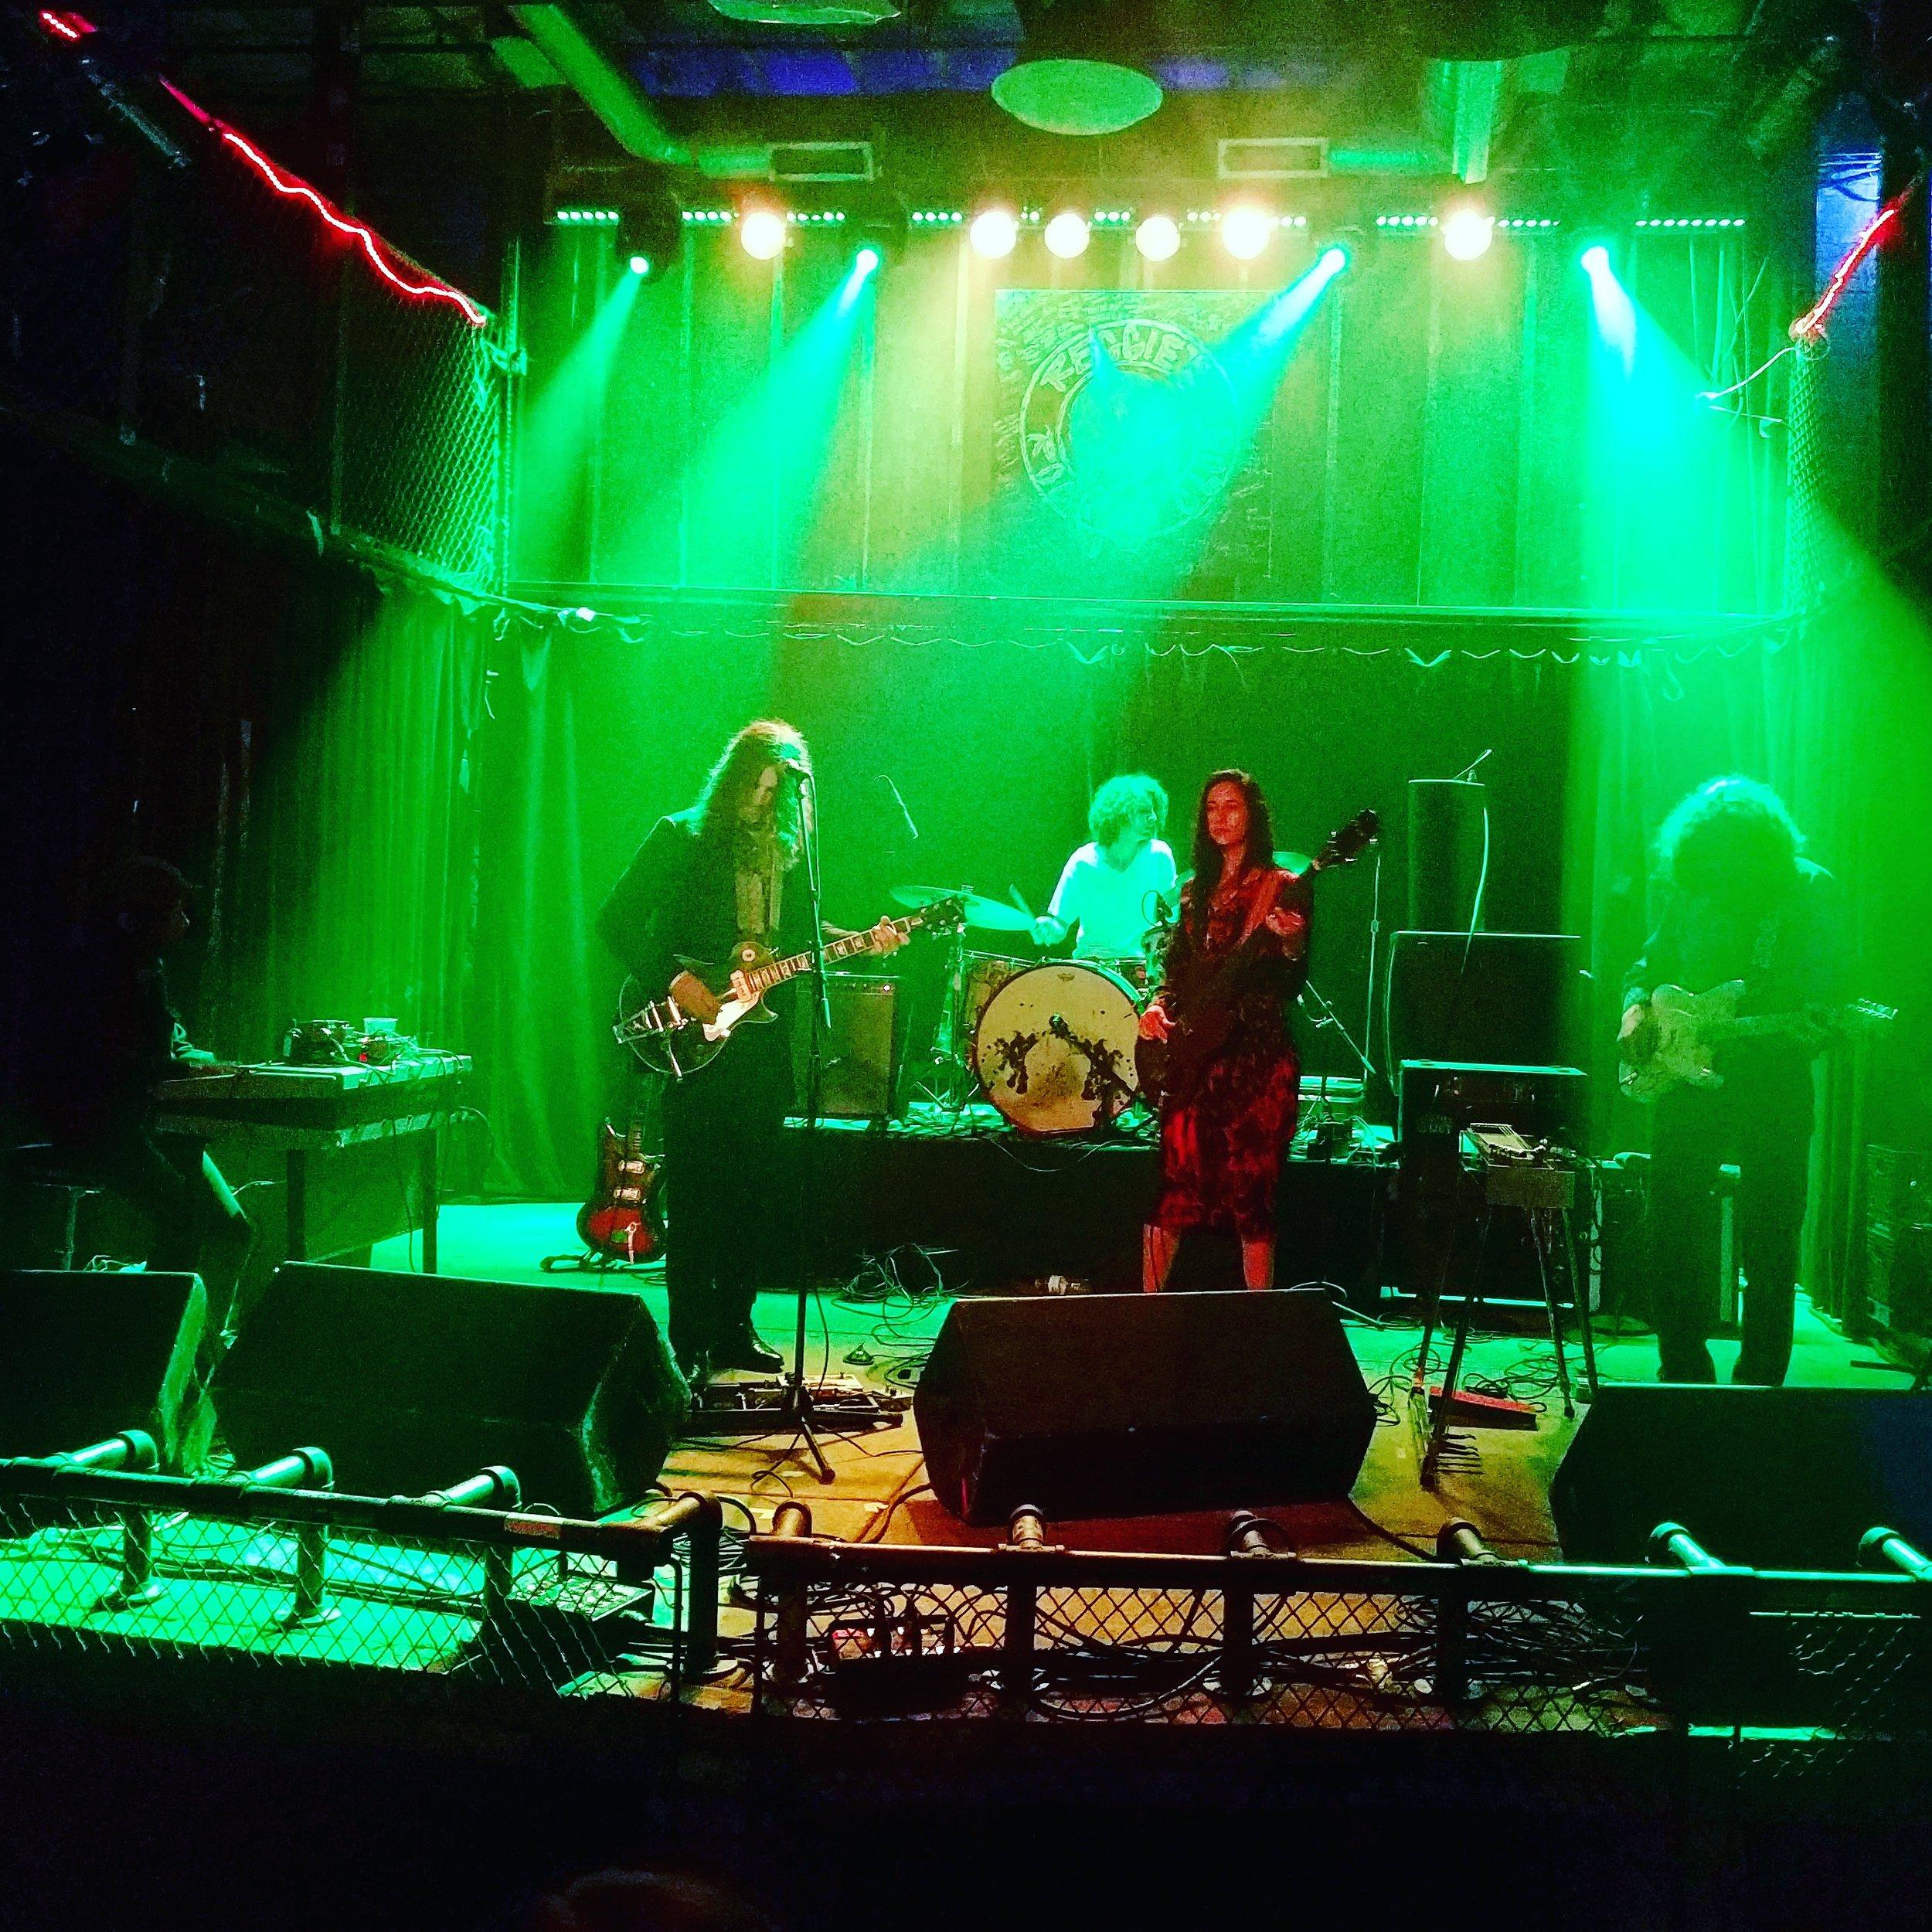 psychic ills | reggie's rock club, chicago | 9.23.16 | @thefaakehipster